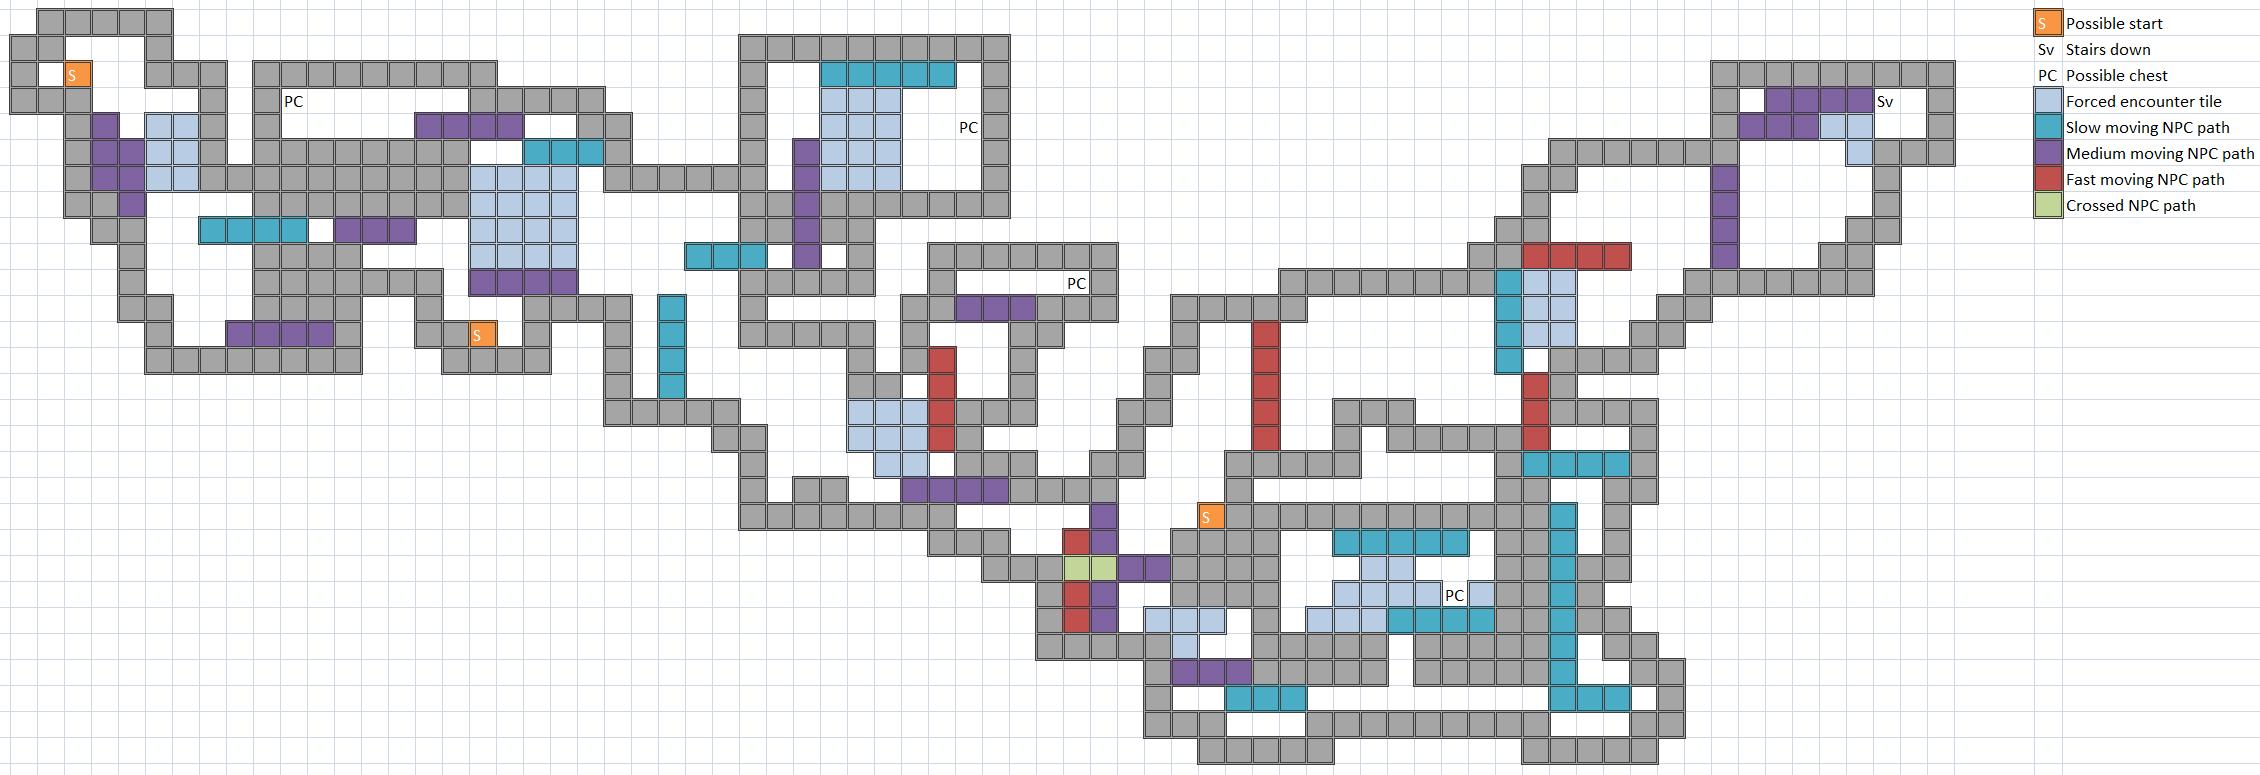 Trespassers Map